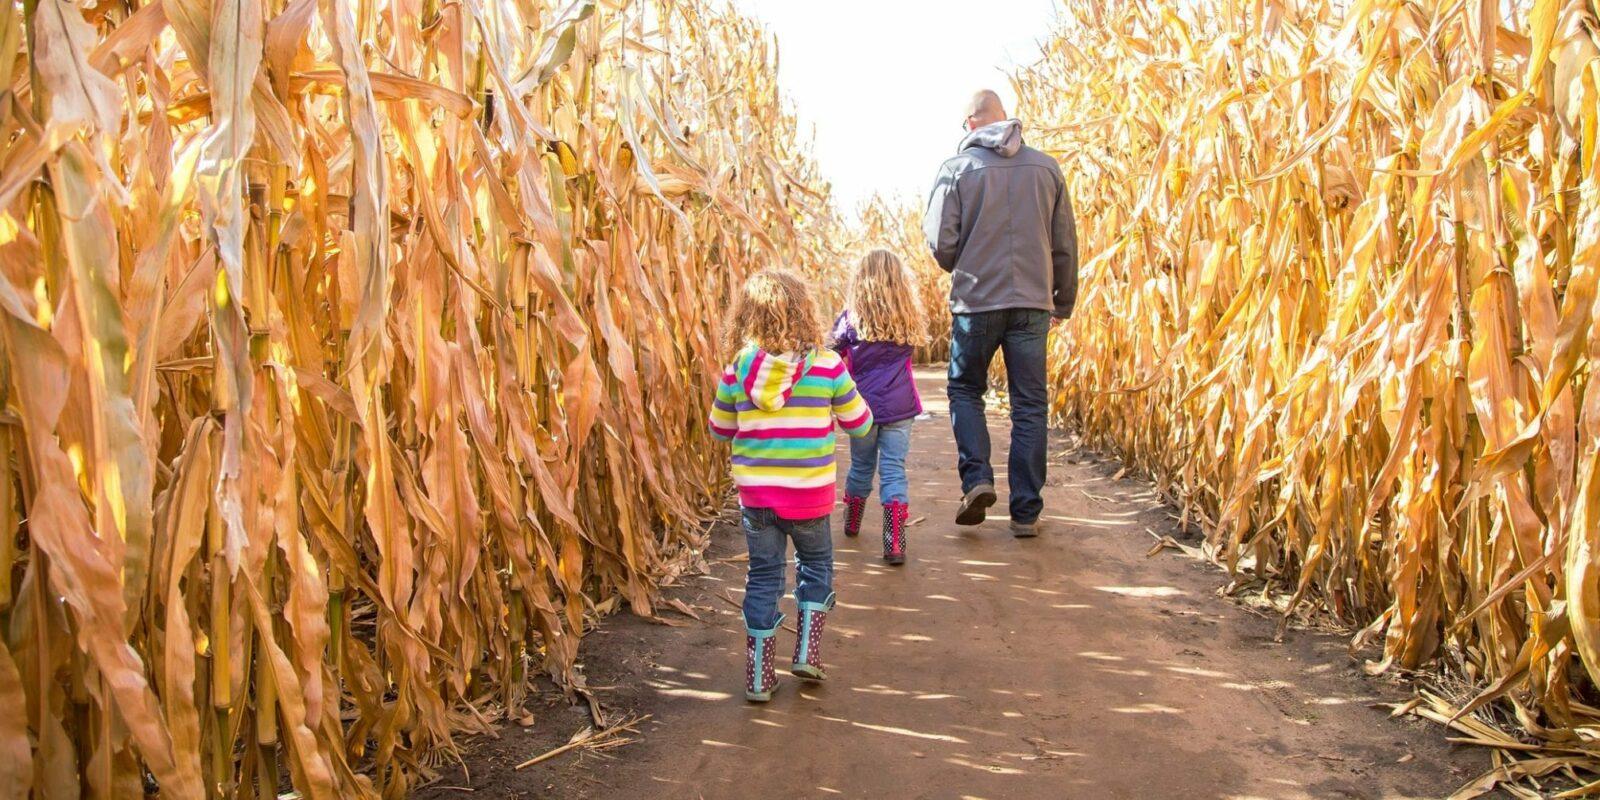 image of people walking through a corn maze